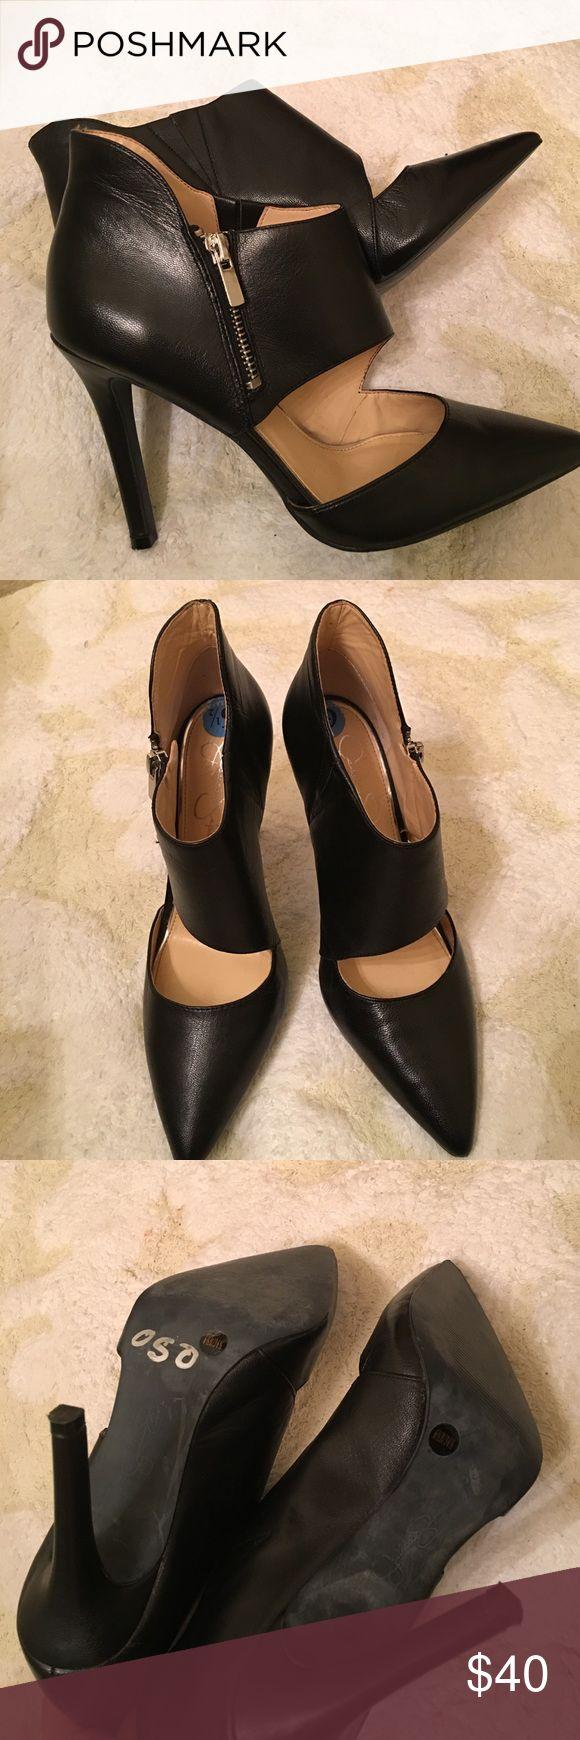 Jessica Simpson heels Beautiful Jessica Simpson shoes . Like new. Jessica Simpson Shoes Heels